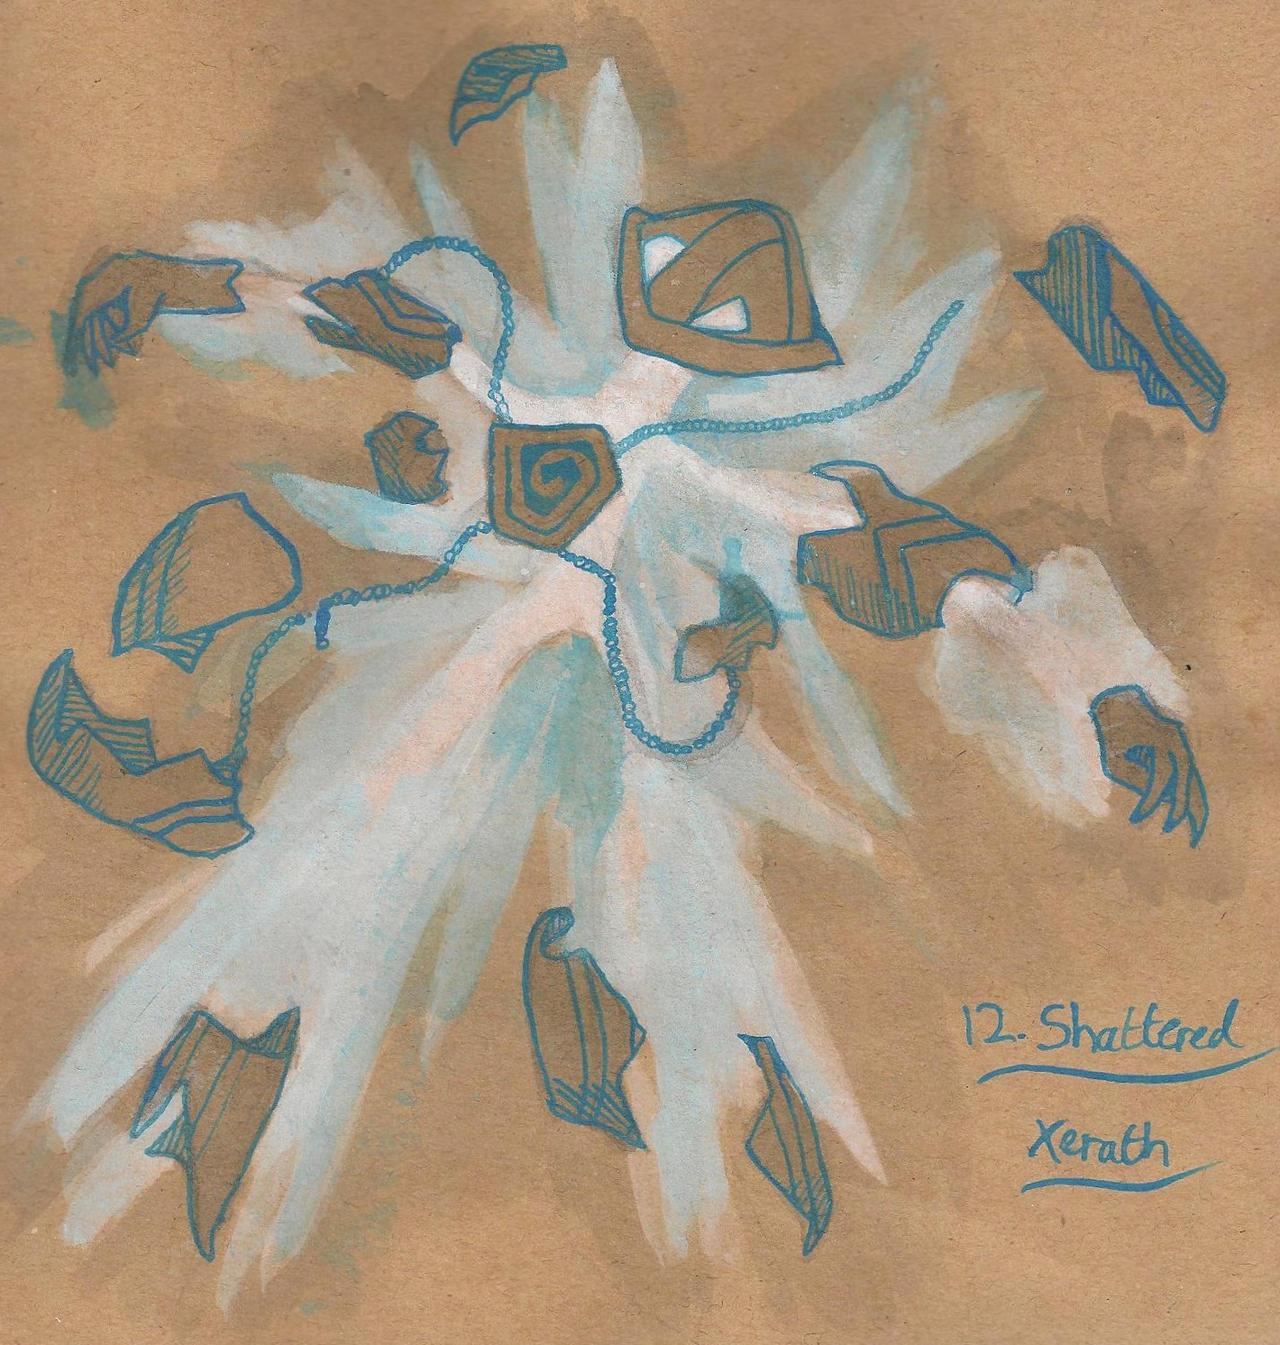 12. Shattered - Xerath